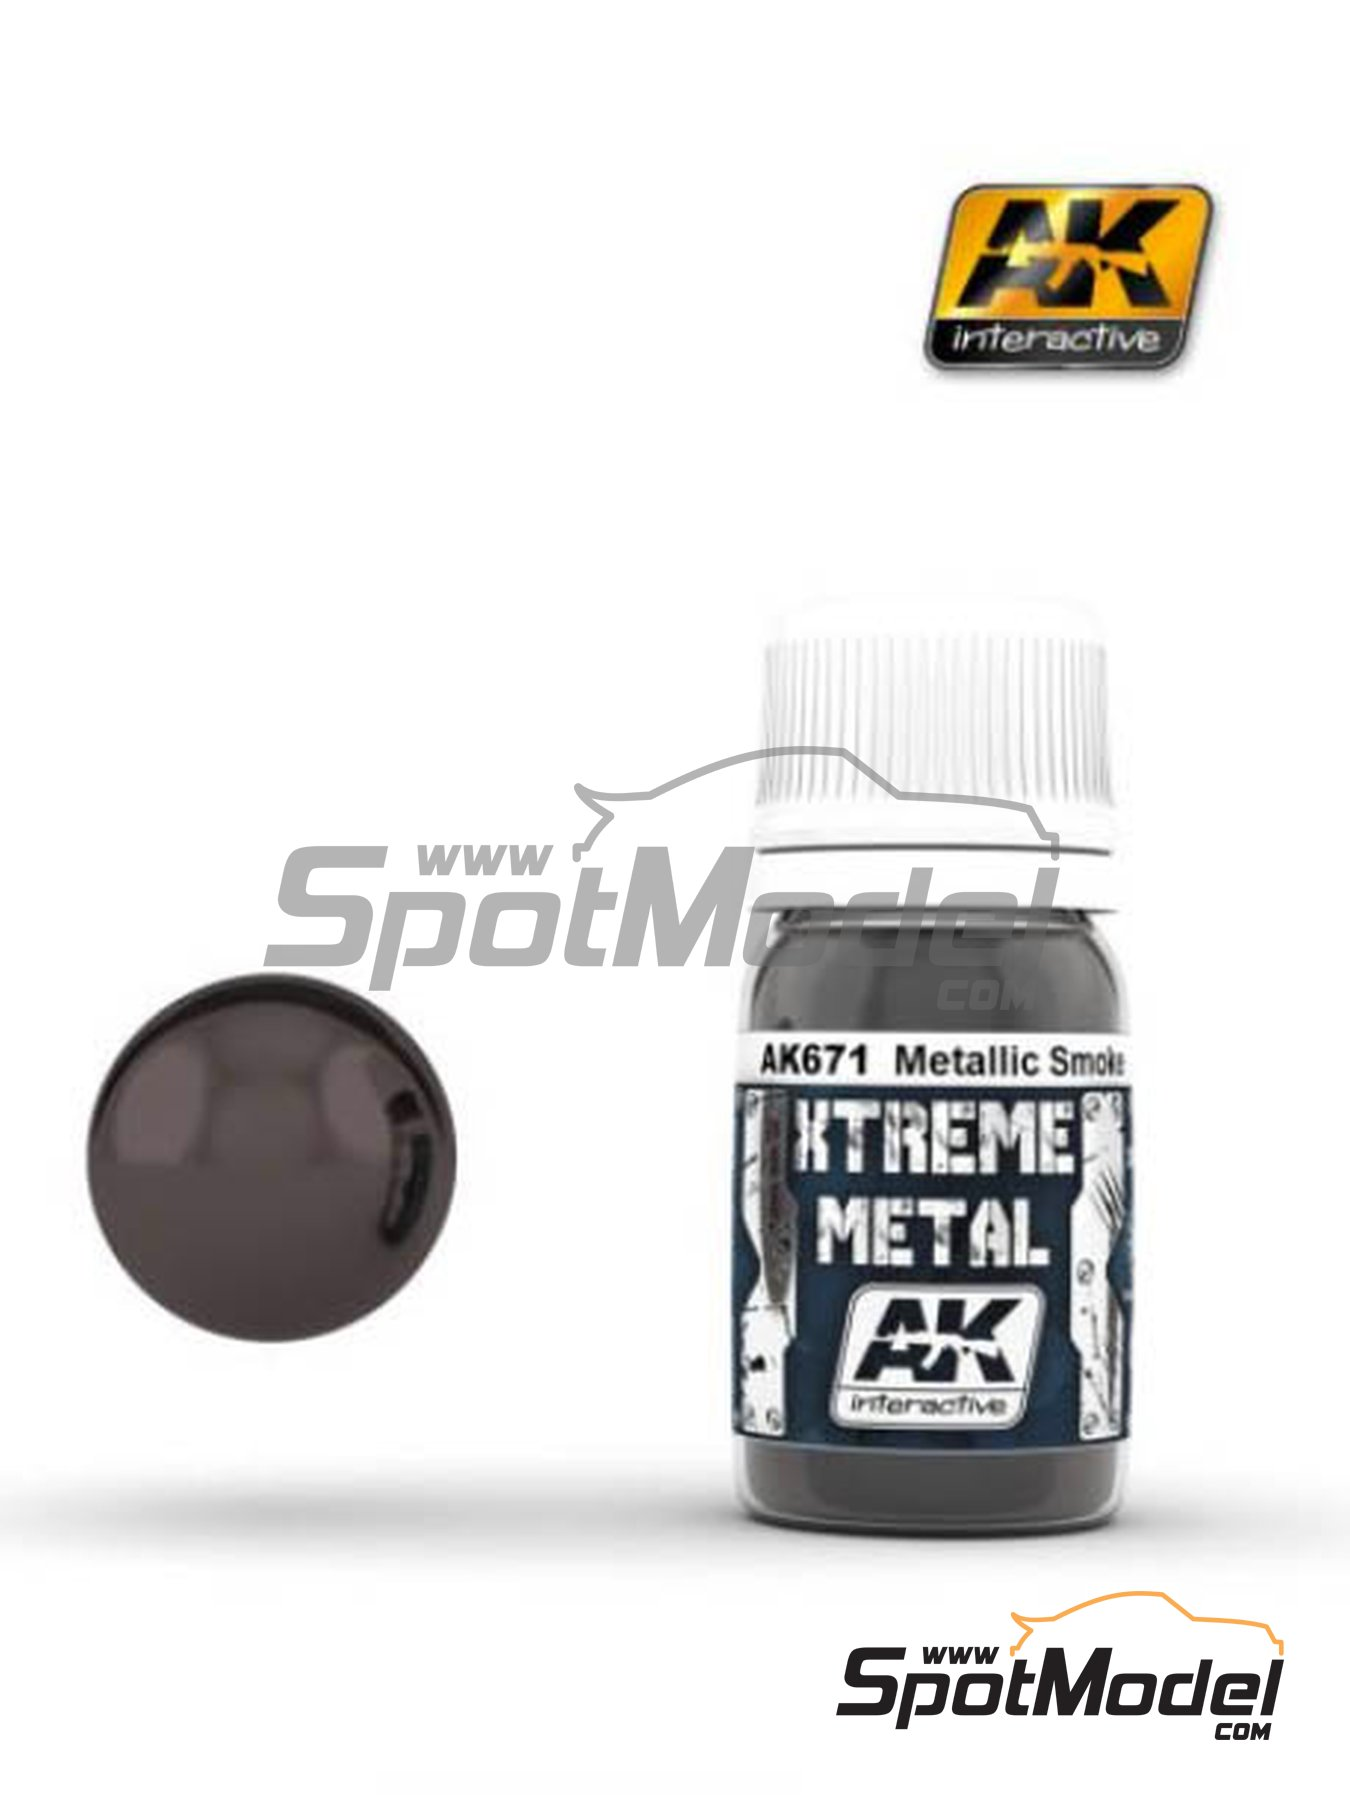 Metallic smoke | Xtreme metal paint manufactured by AK Interactive (ref.AK-671) image